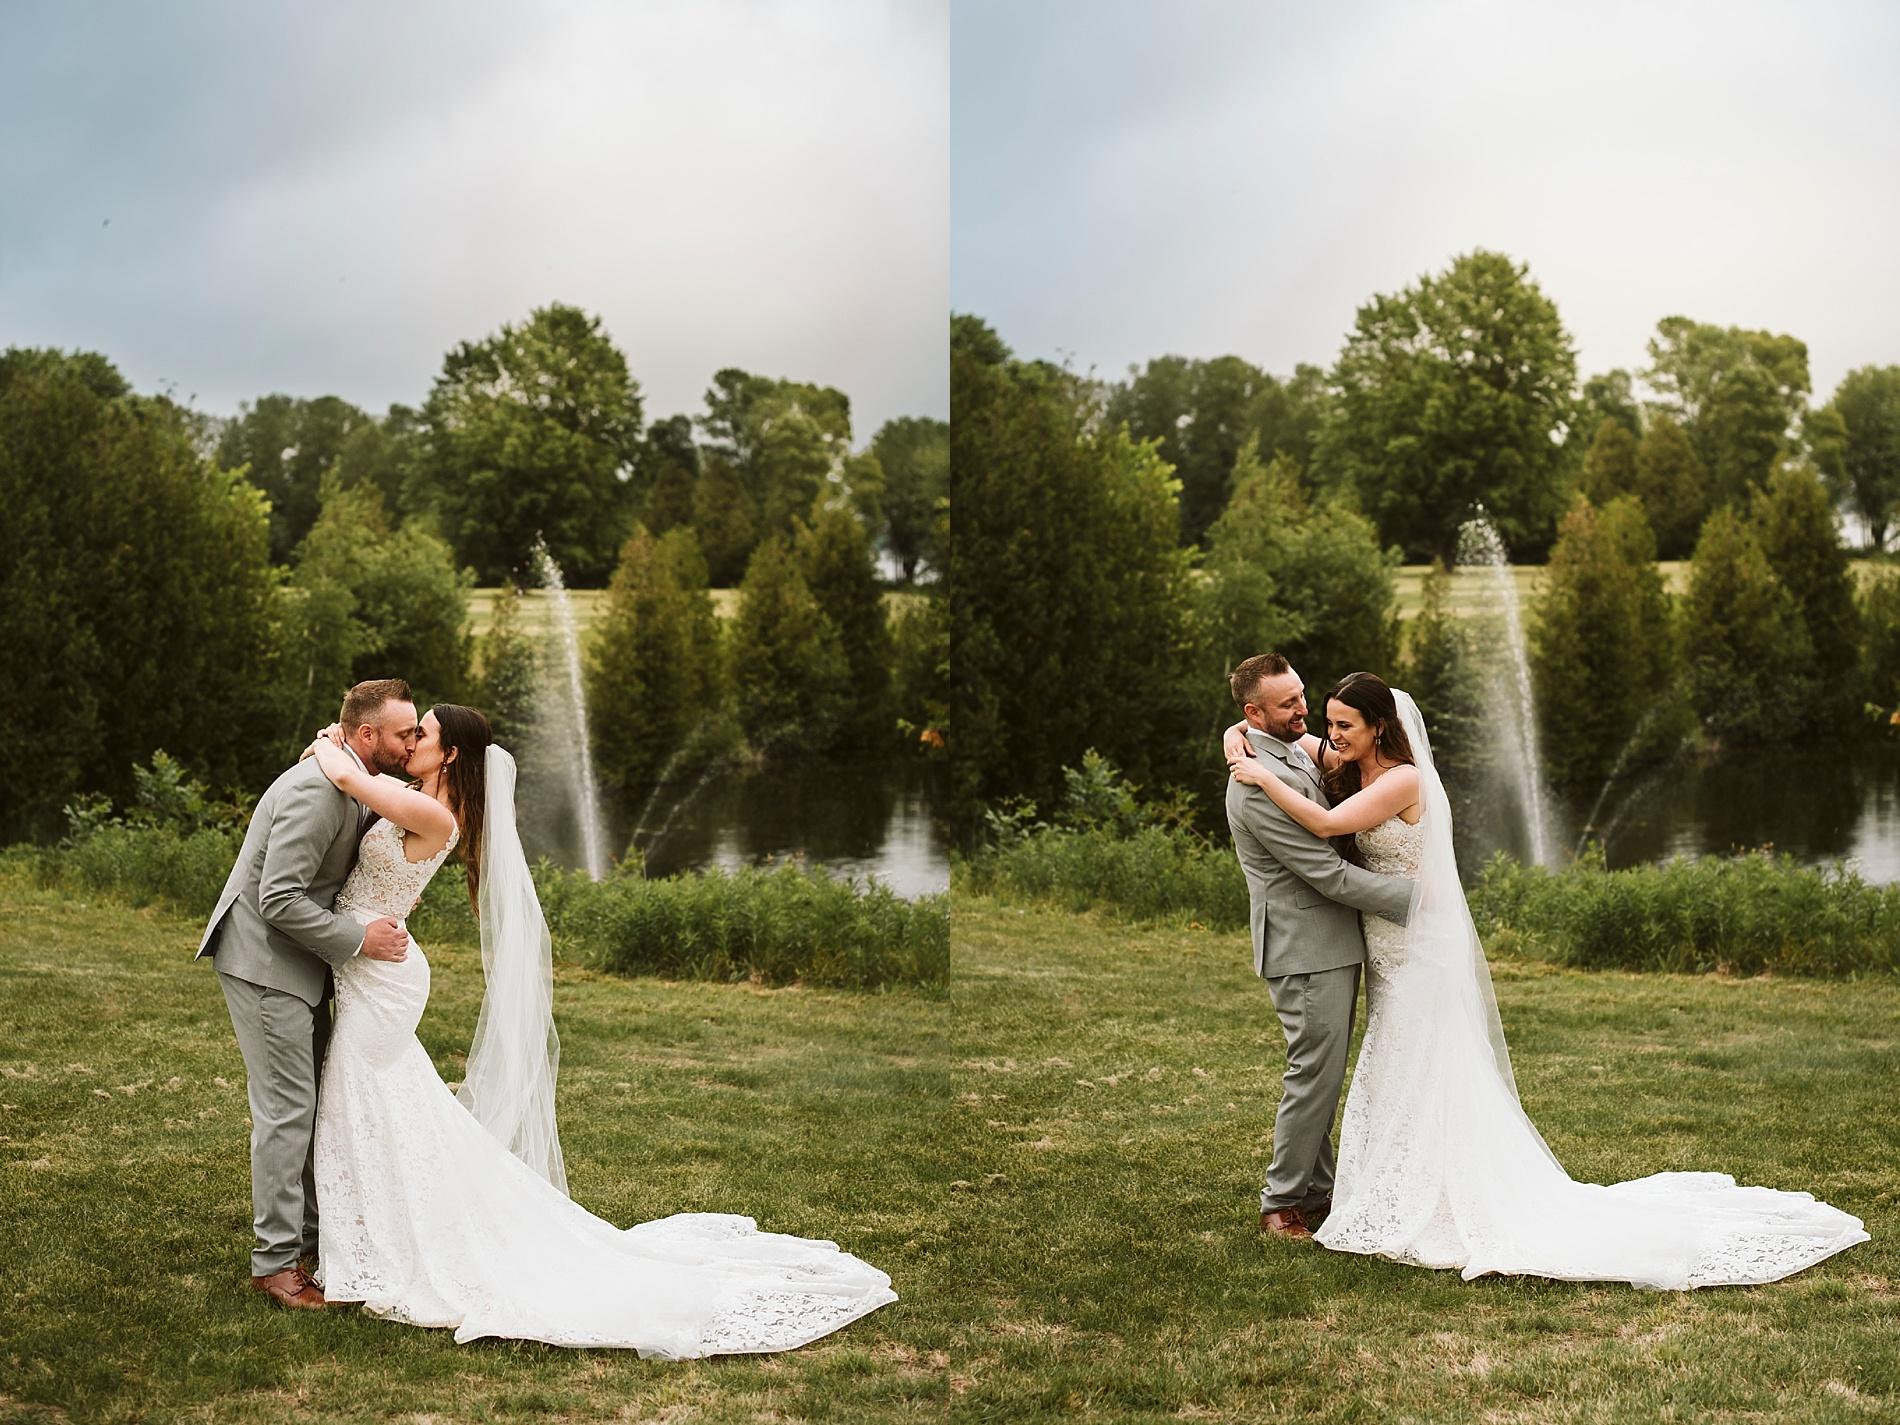 Kawartha_Lakes_Wedding_Bobcageon_Eganridge_Resort_Toronto_Photographer_0053.jpg